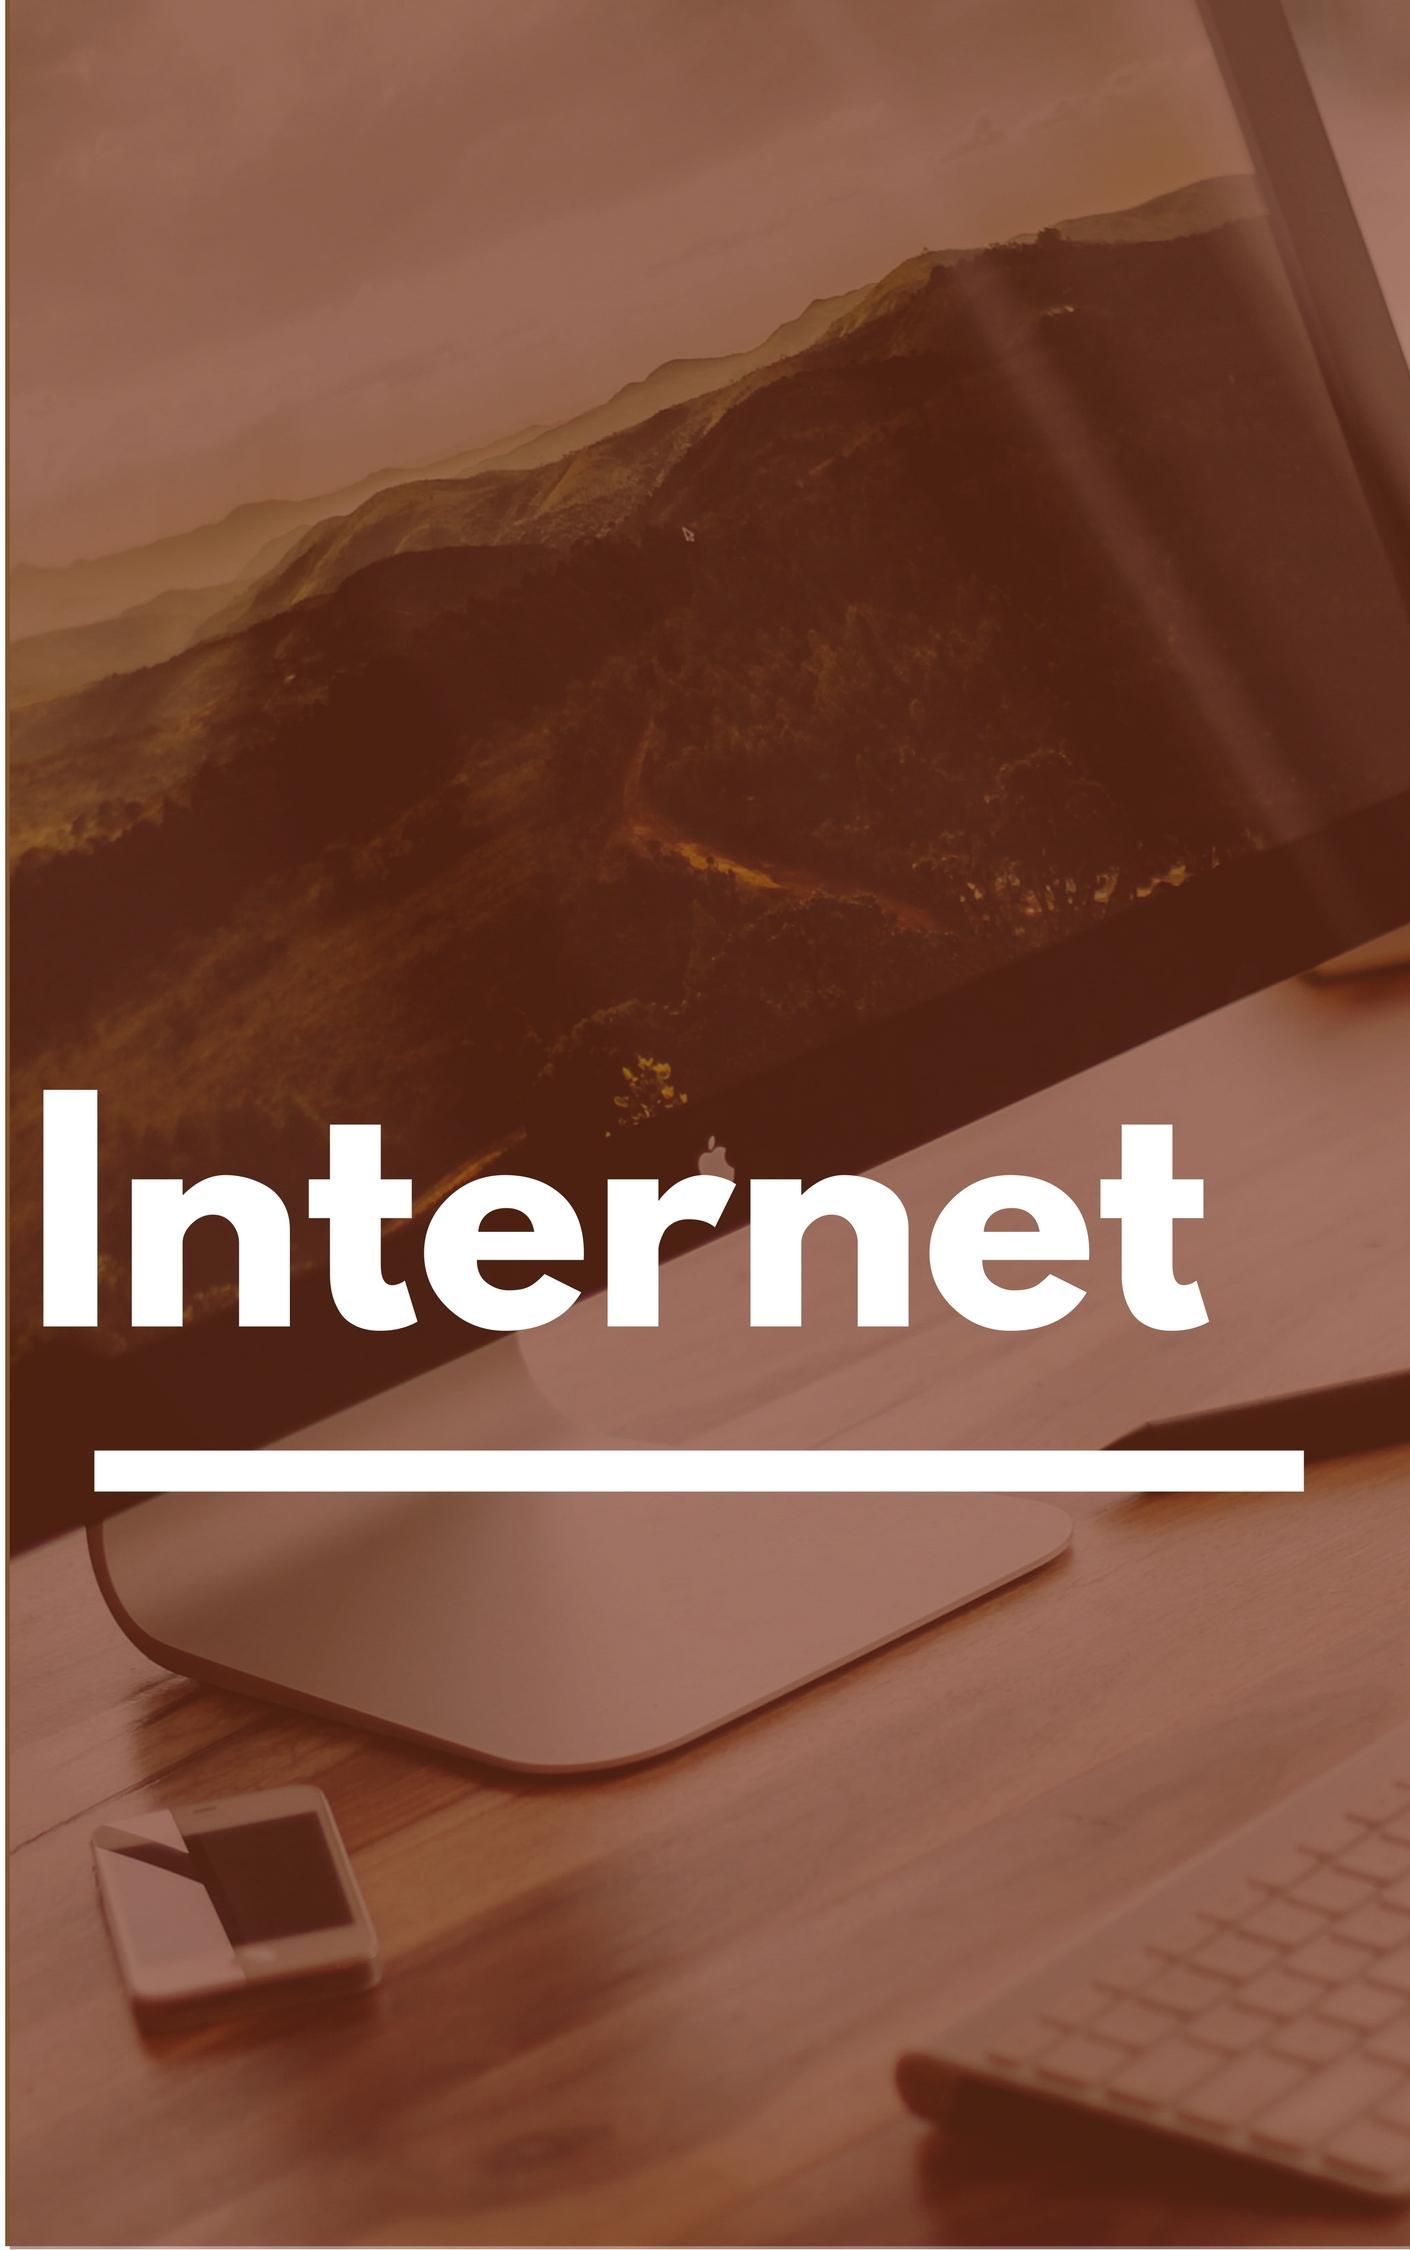 Internet Policy - Glen Rock Public Library - NJ